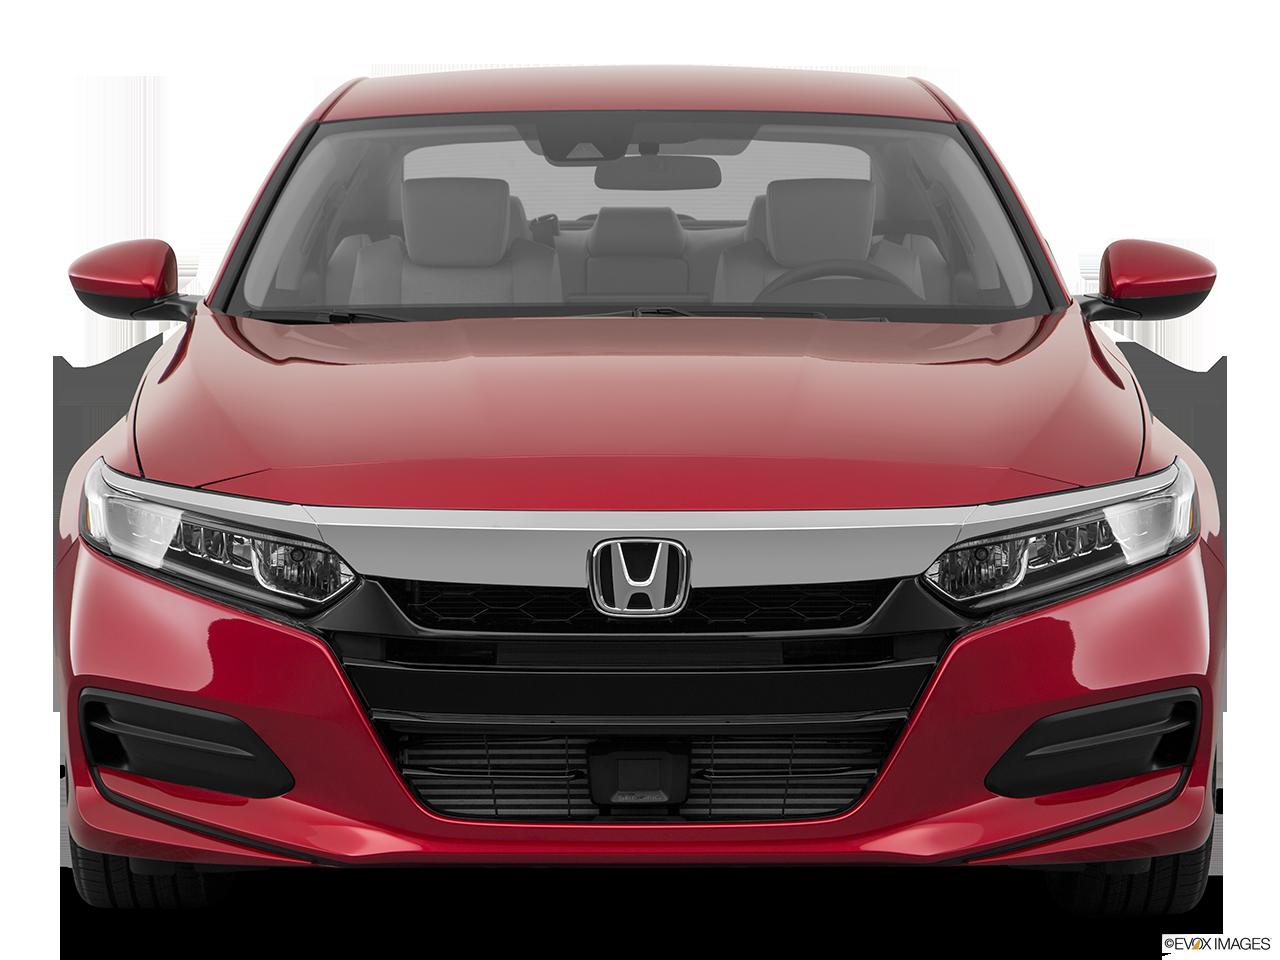 2019 Honda Accord photo